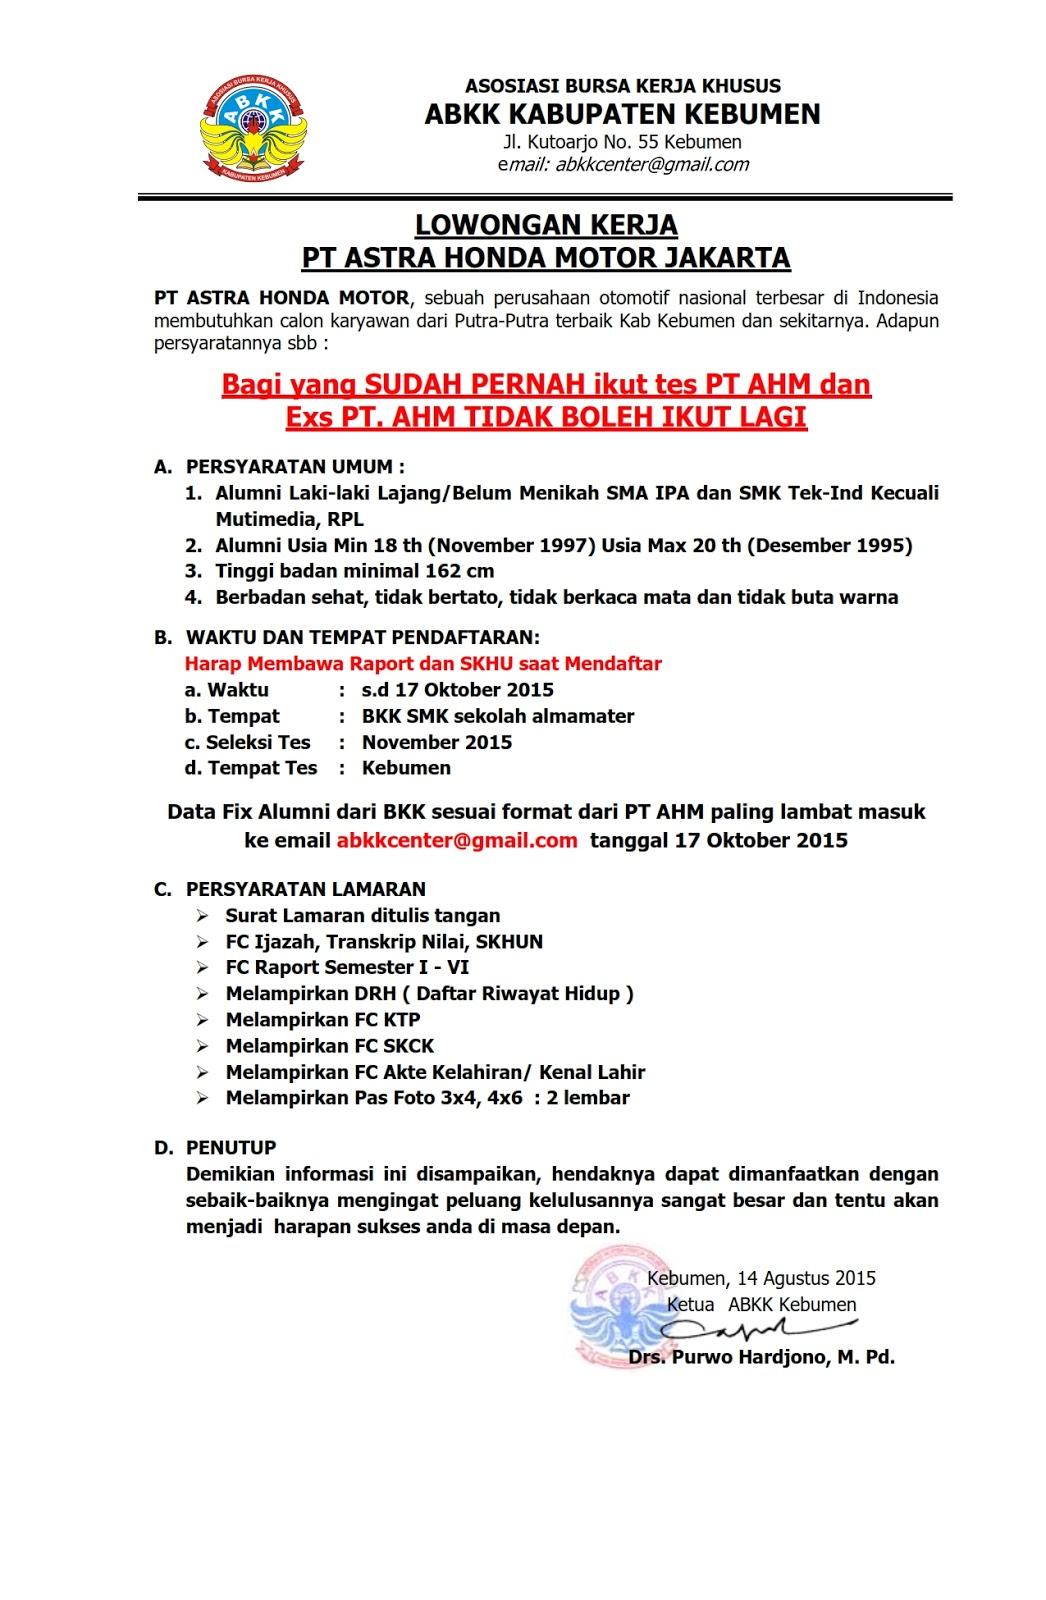 Info Terkini Lowongan Kerja Astra Honda Motor